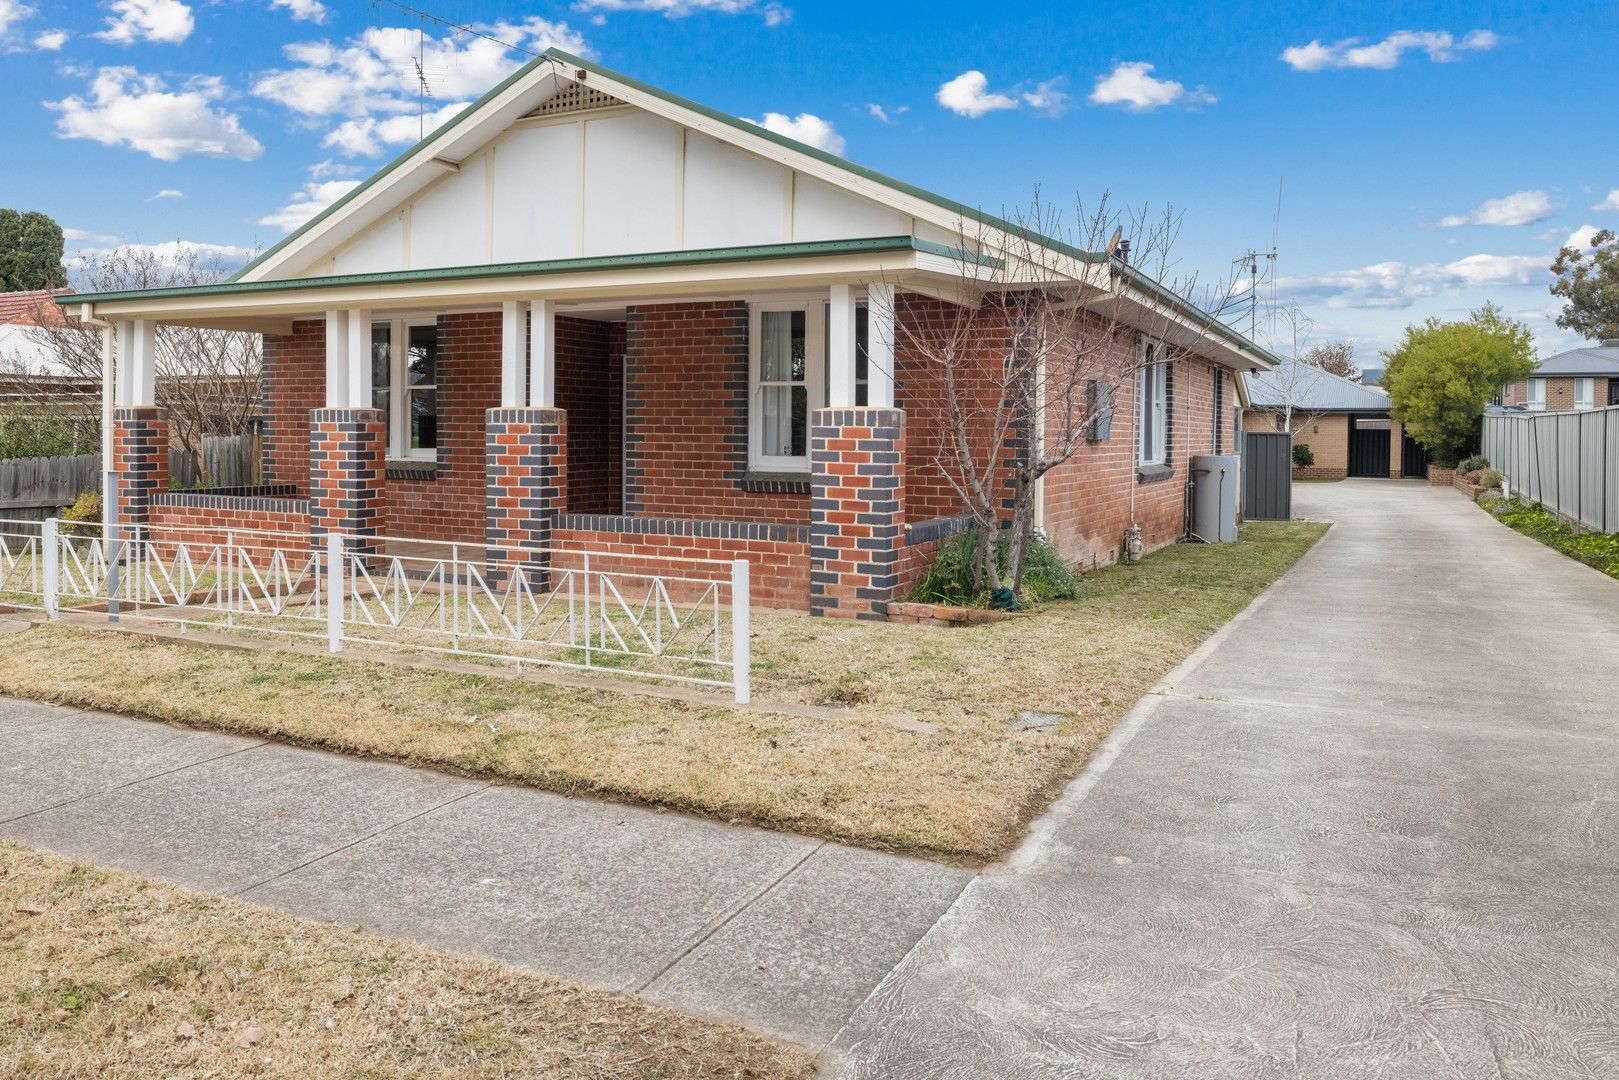 153 & 153a Faithfull Street, Goulburn NSW 2580, Image 0